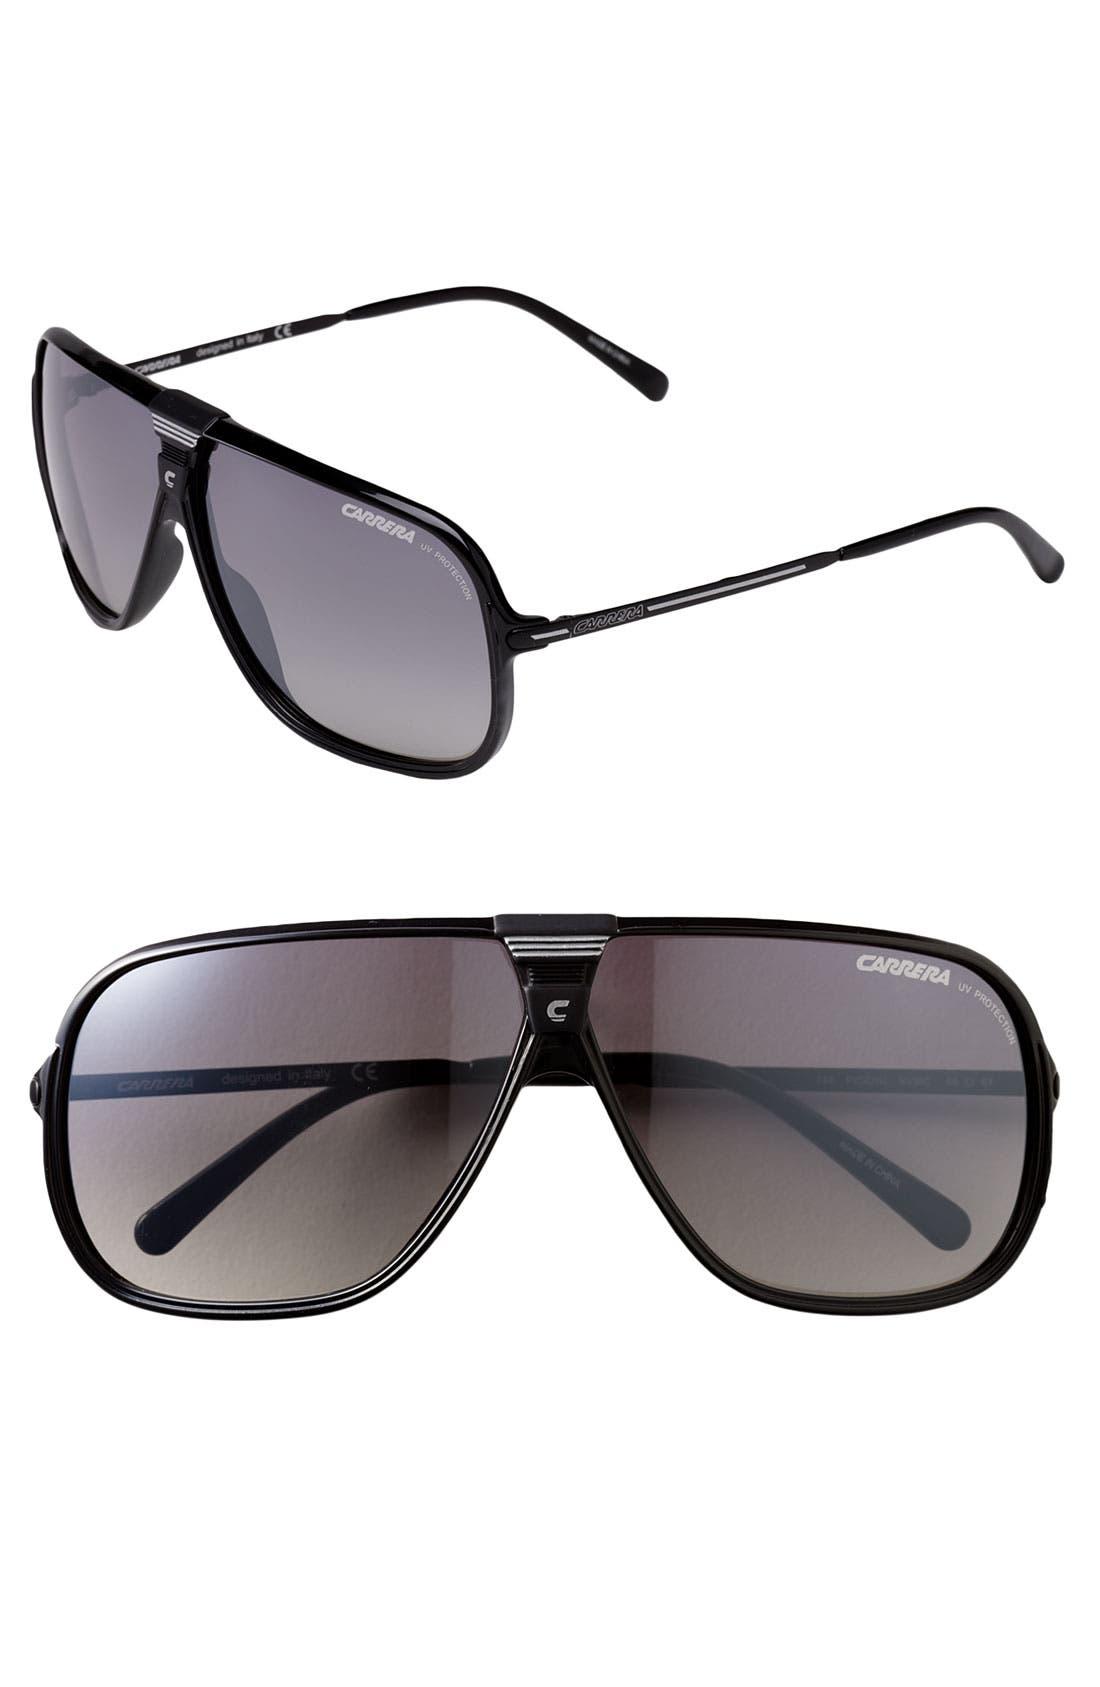 Alternate Image 1 Selected - Carrera Eyewear 'Picchu' Aviator Sunglasses